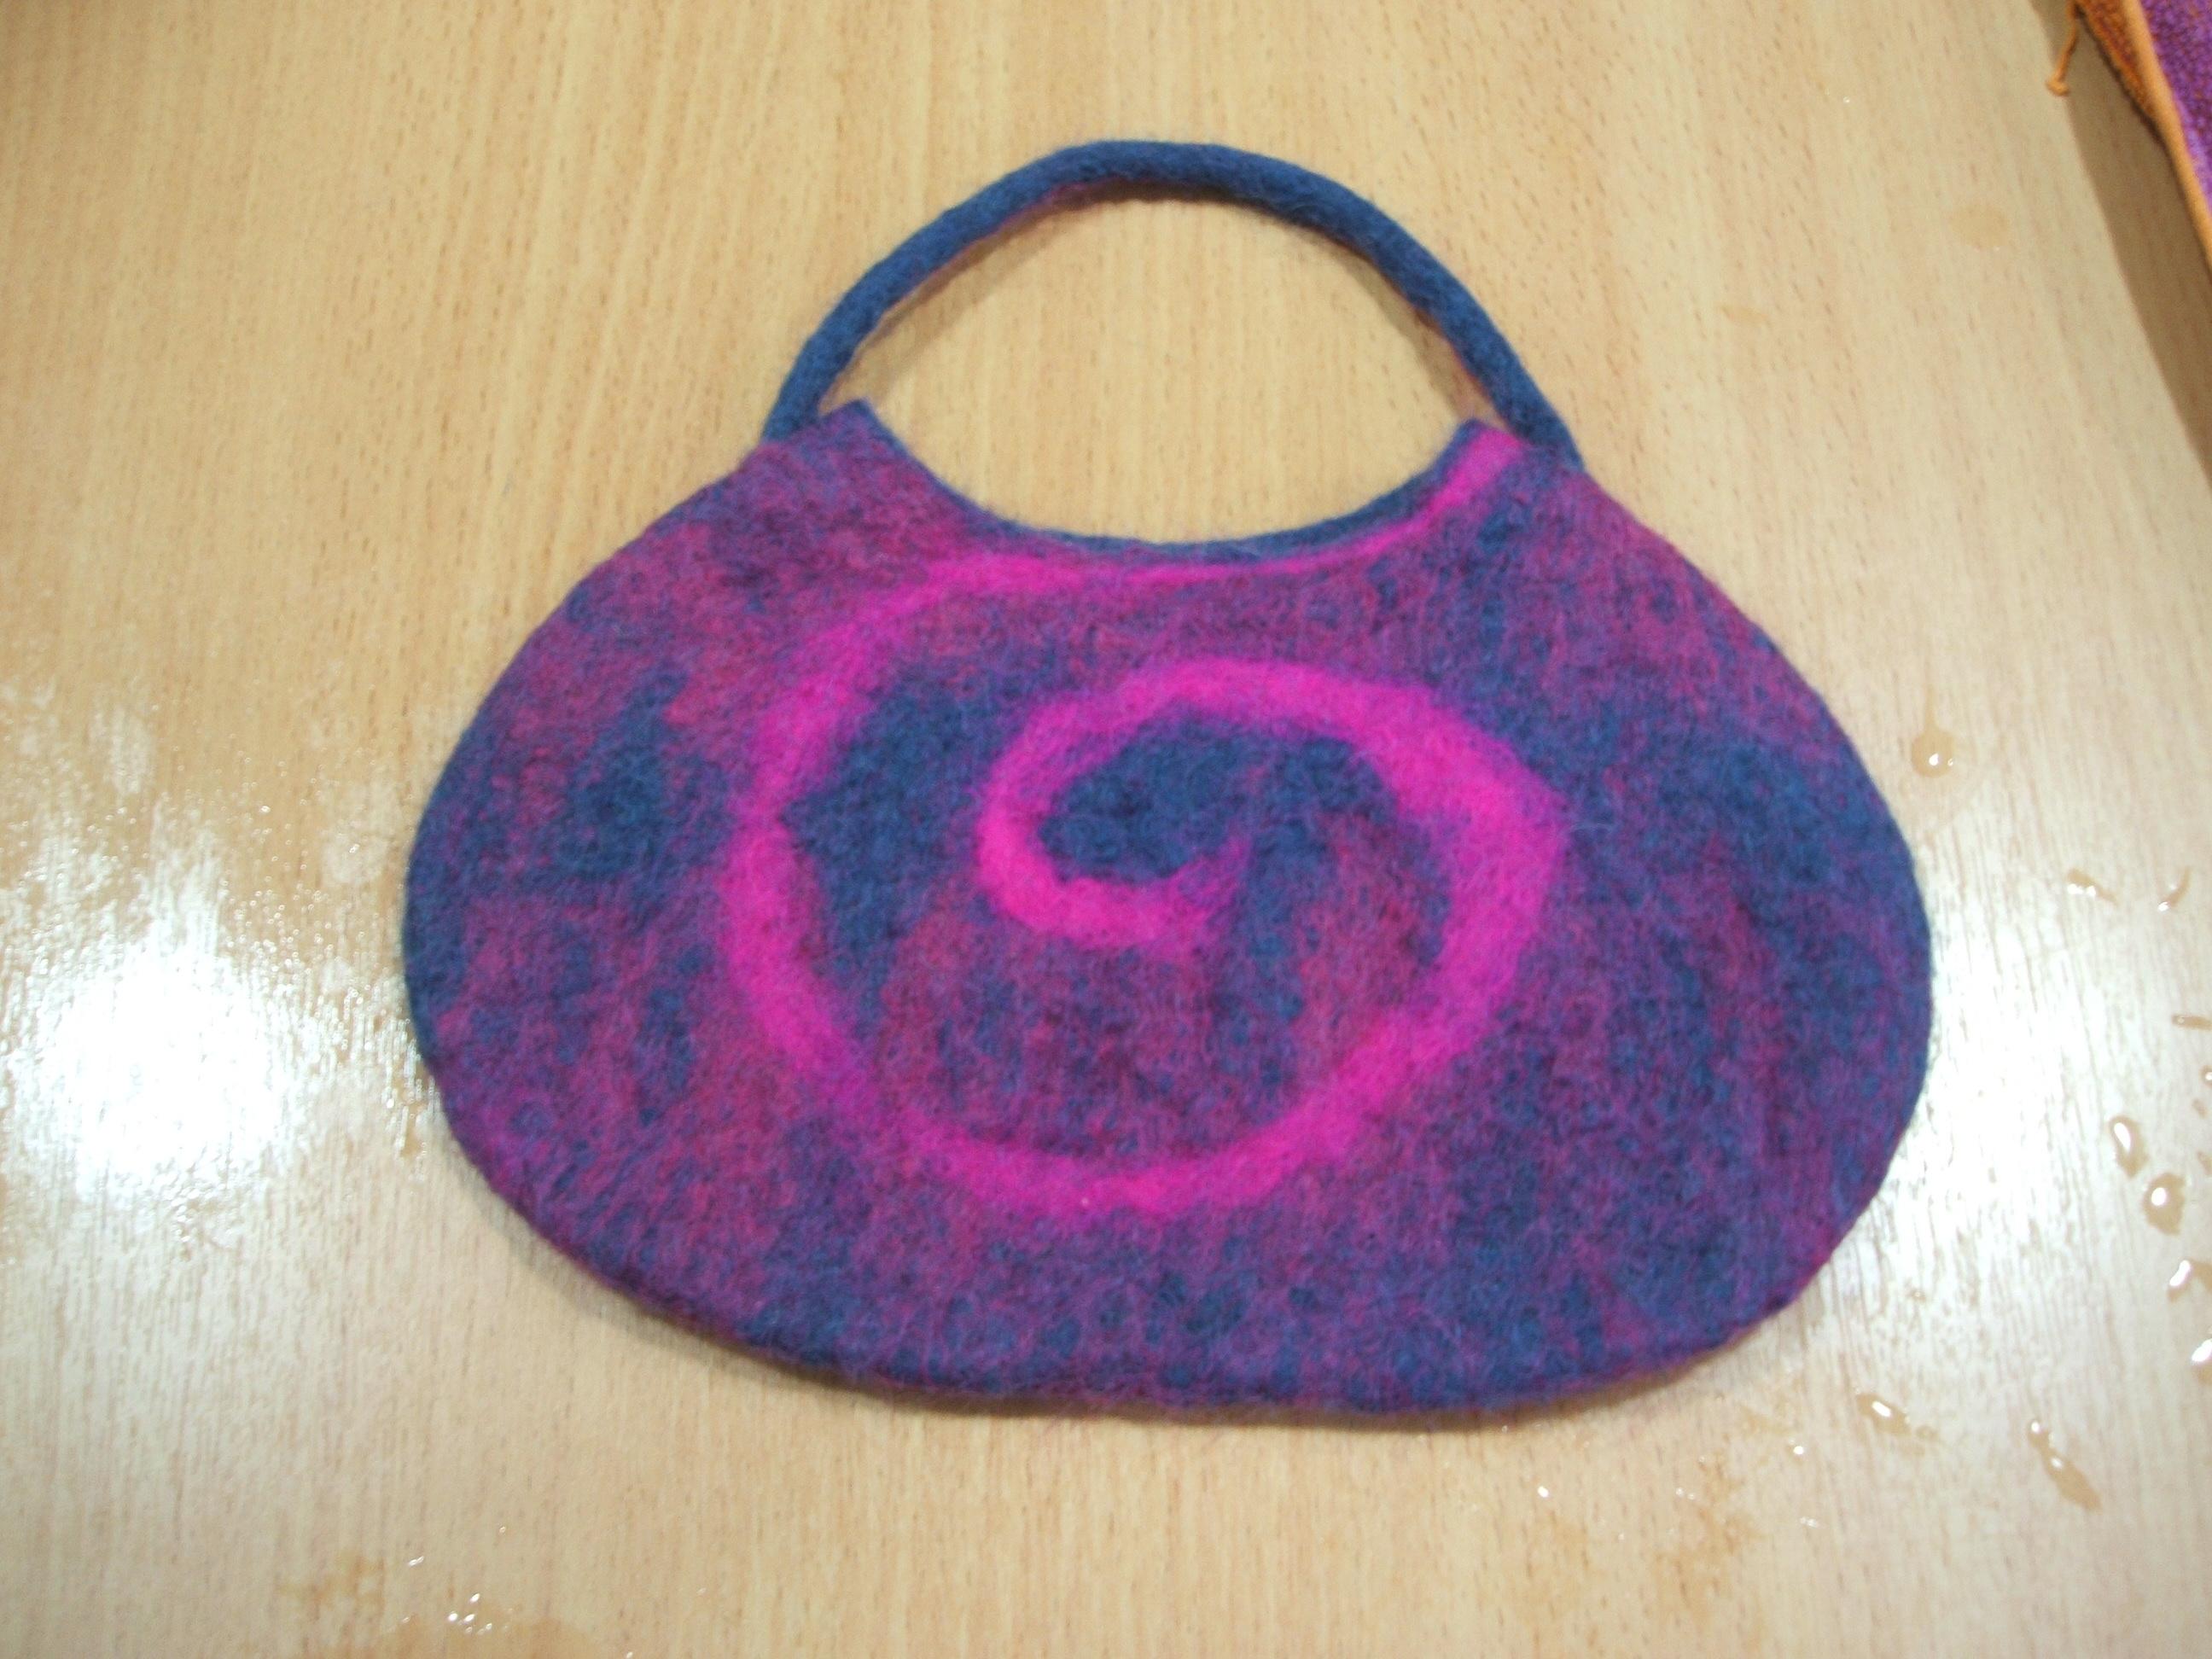 Anne's seamless felt bag